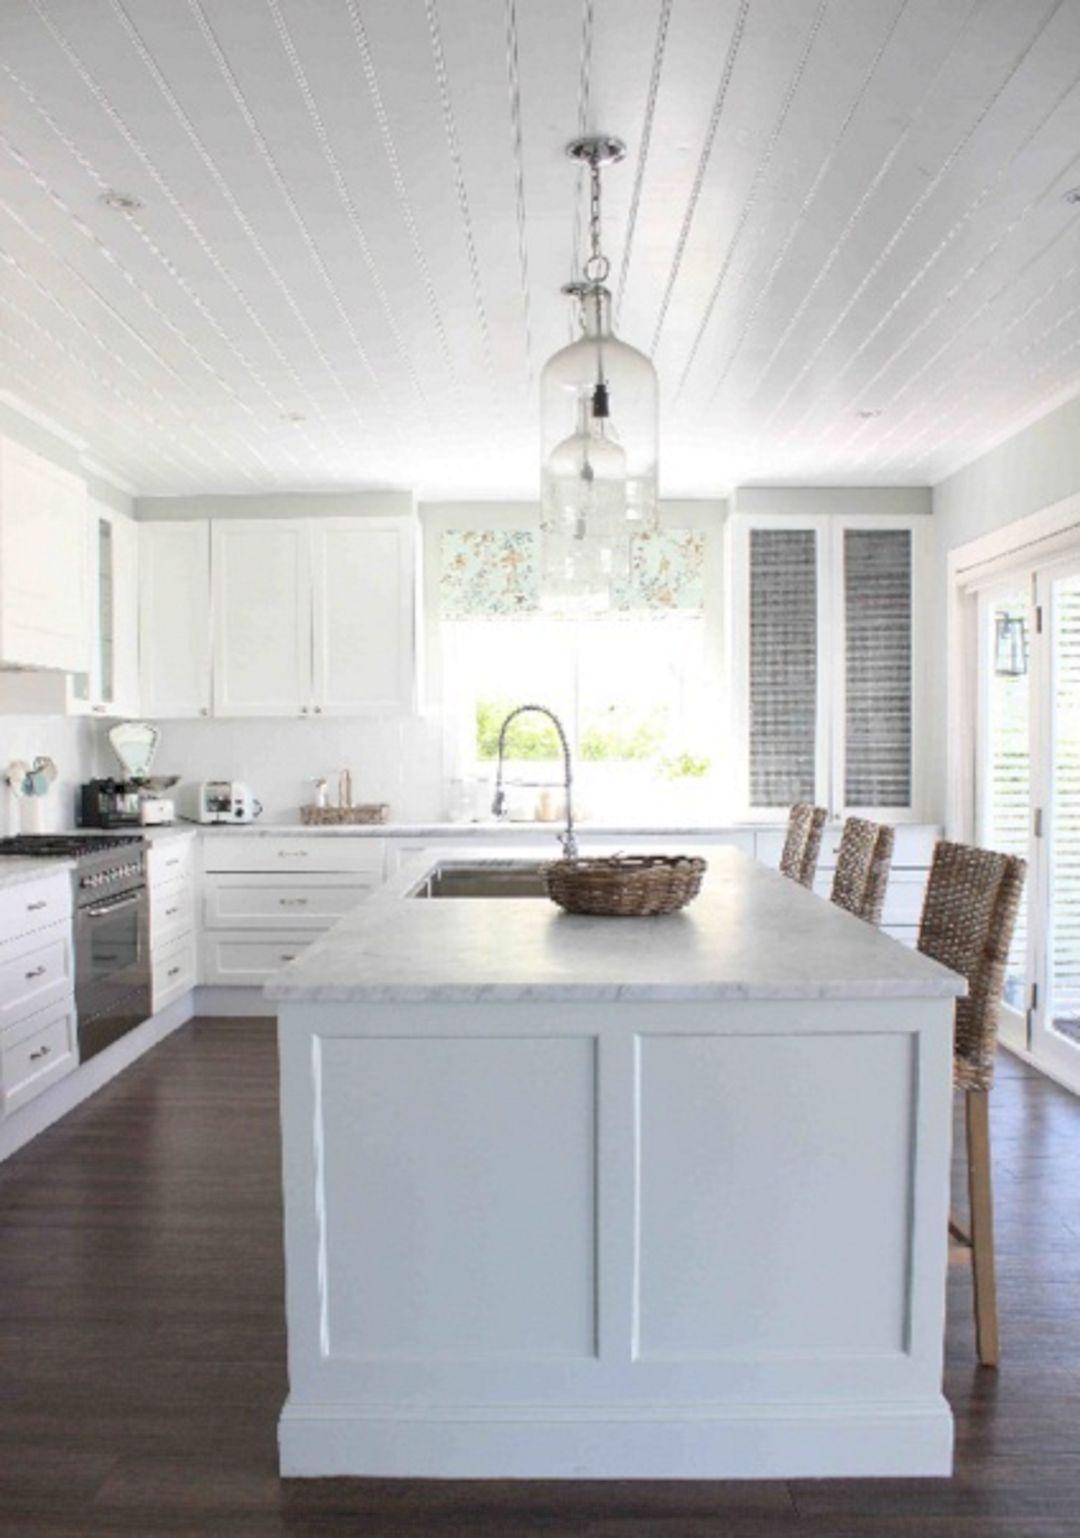 inspiring 30 beautiful hamptons kitchen interior design for stylish rh in pinterest com